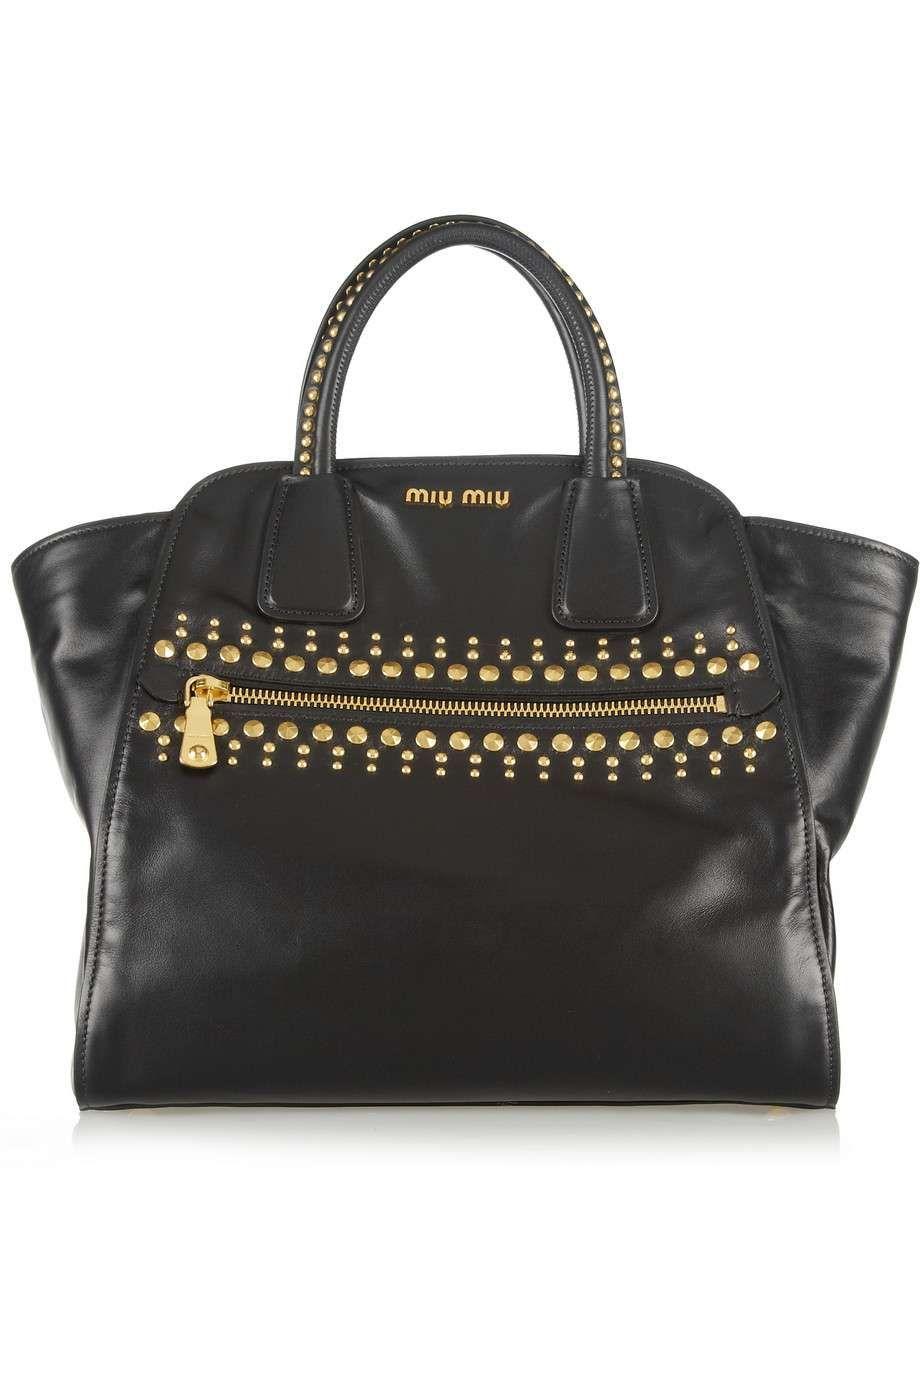 Miu Miu Studded leather trapeze bag  bf7f78325